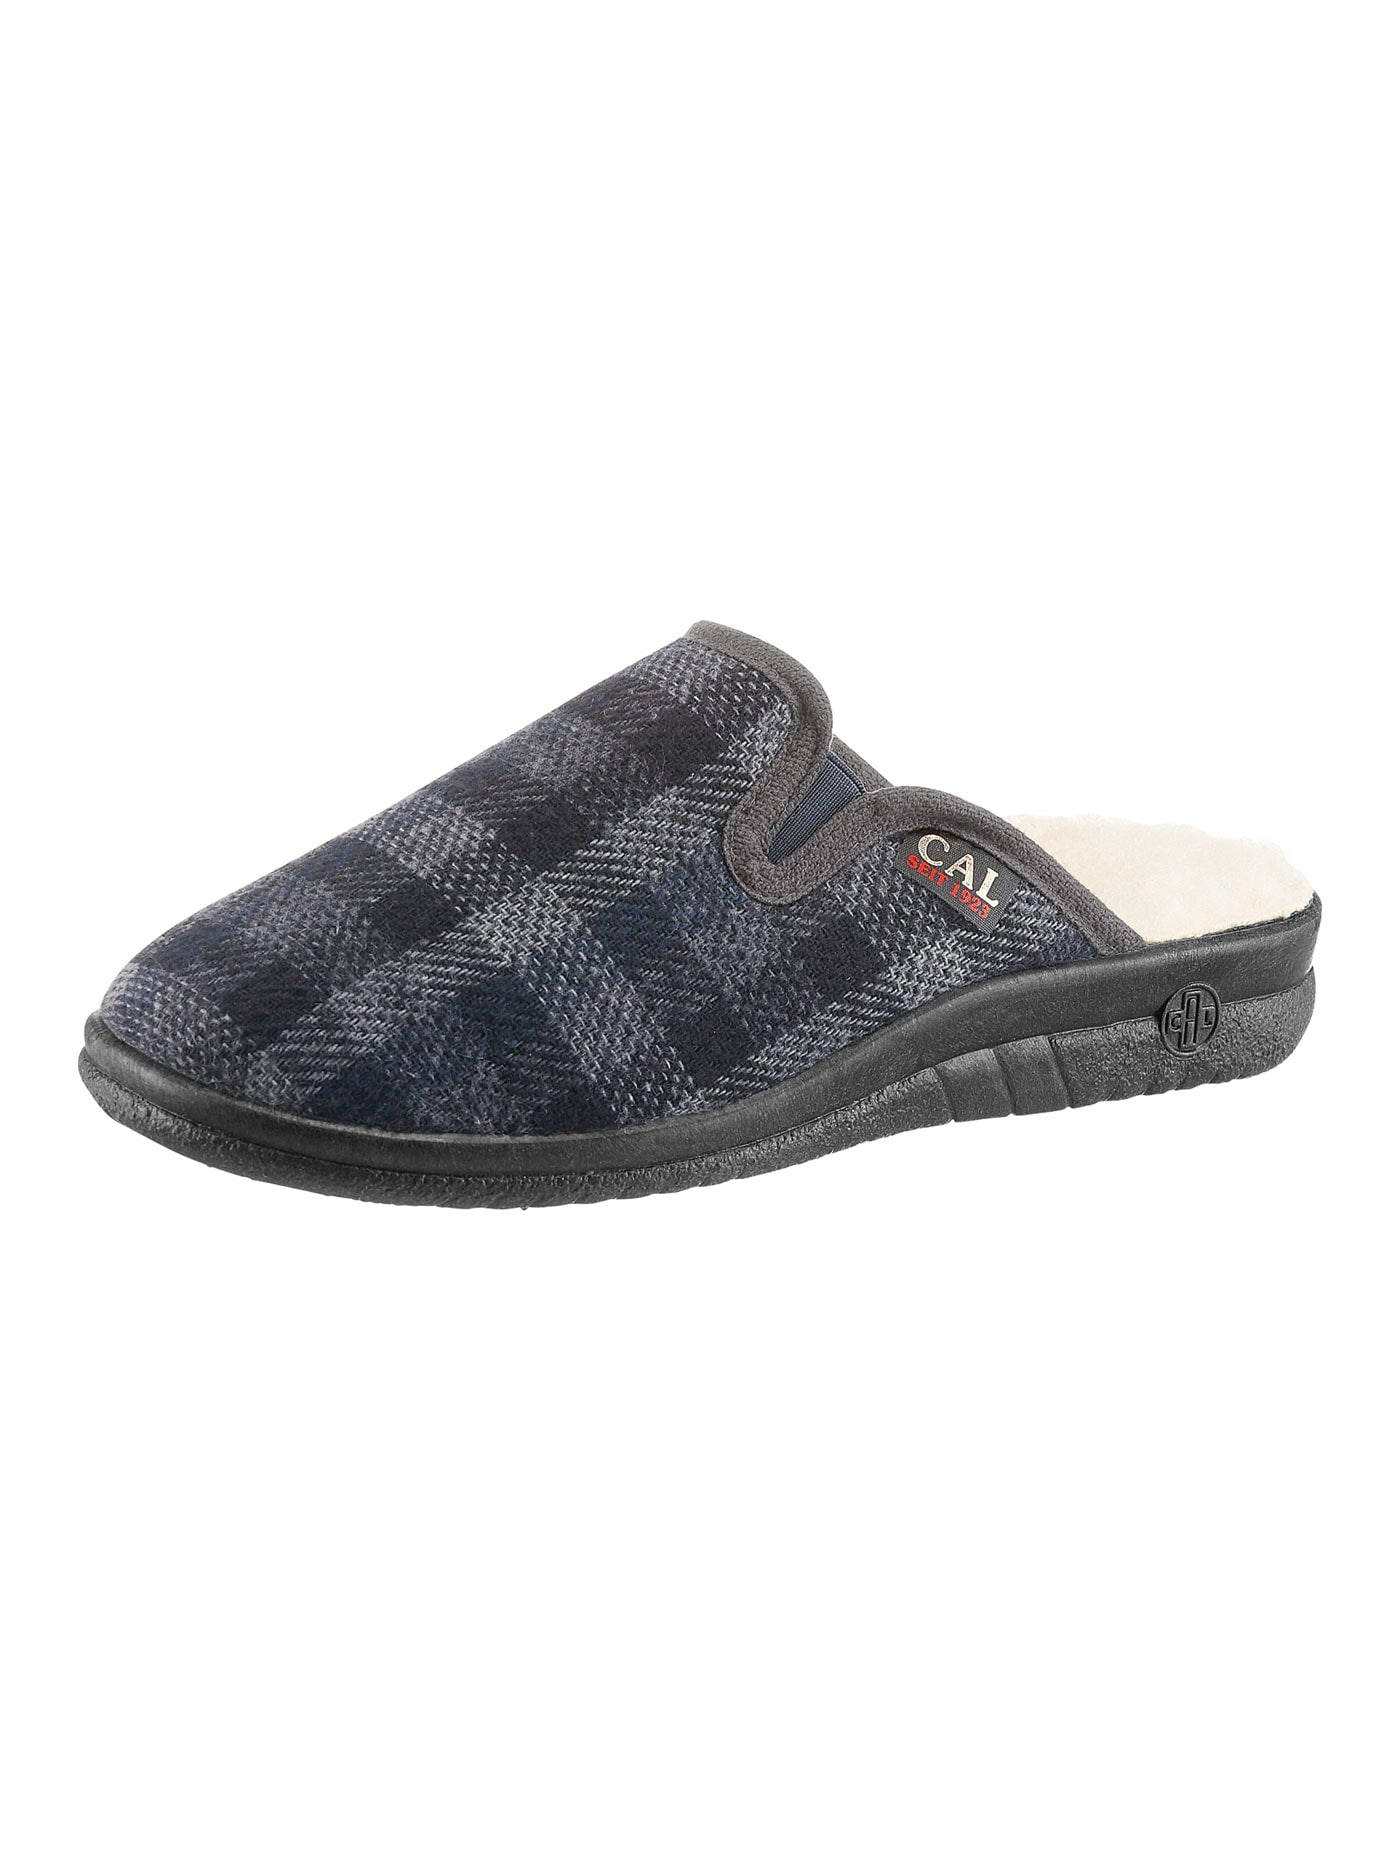 Landgraf Pantoffel mit Wörishofer Fußbett   Schuhe > Hausschuhe   Classic